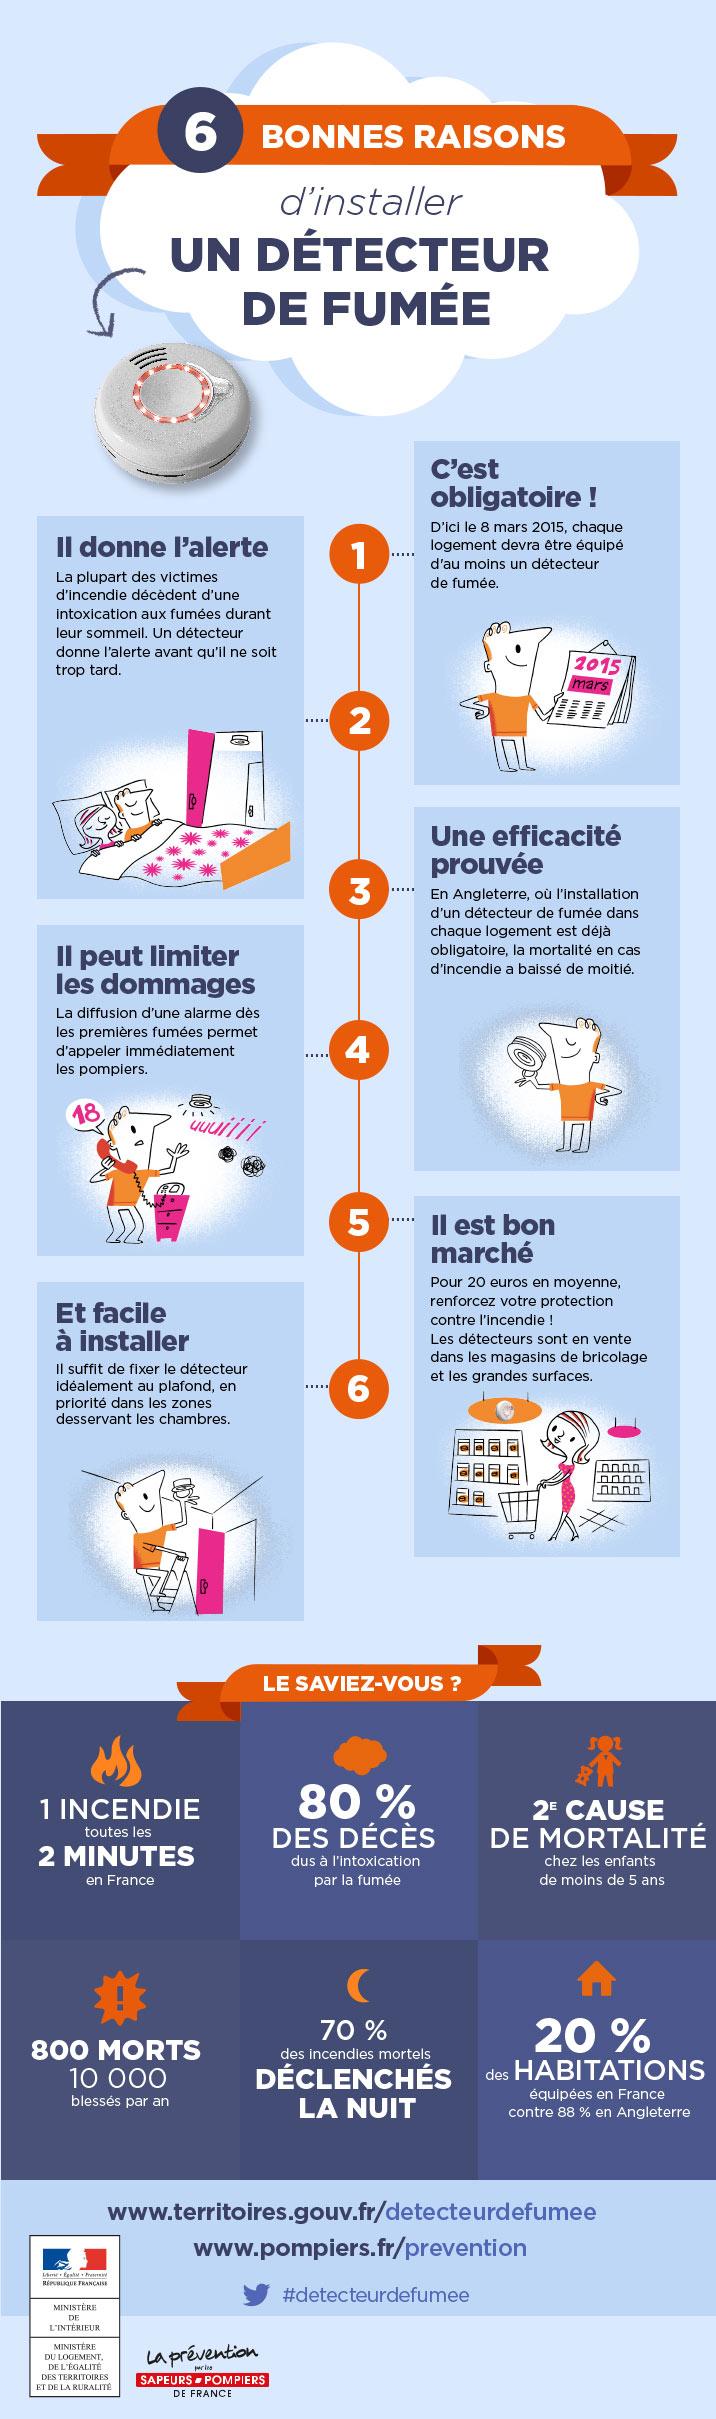 infographie_daaf